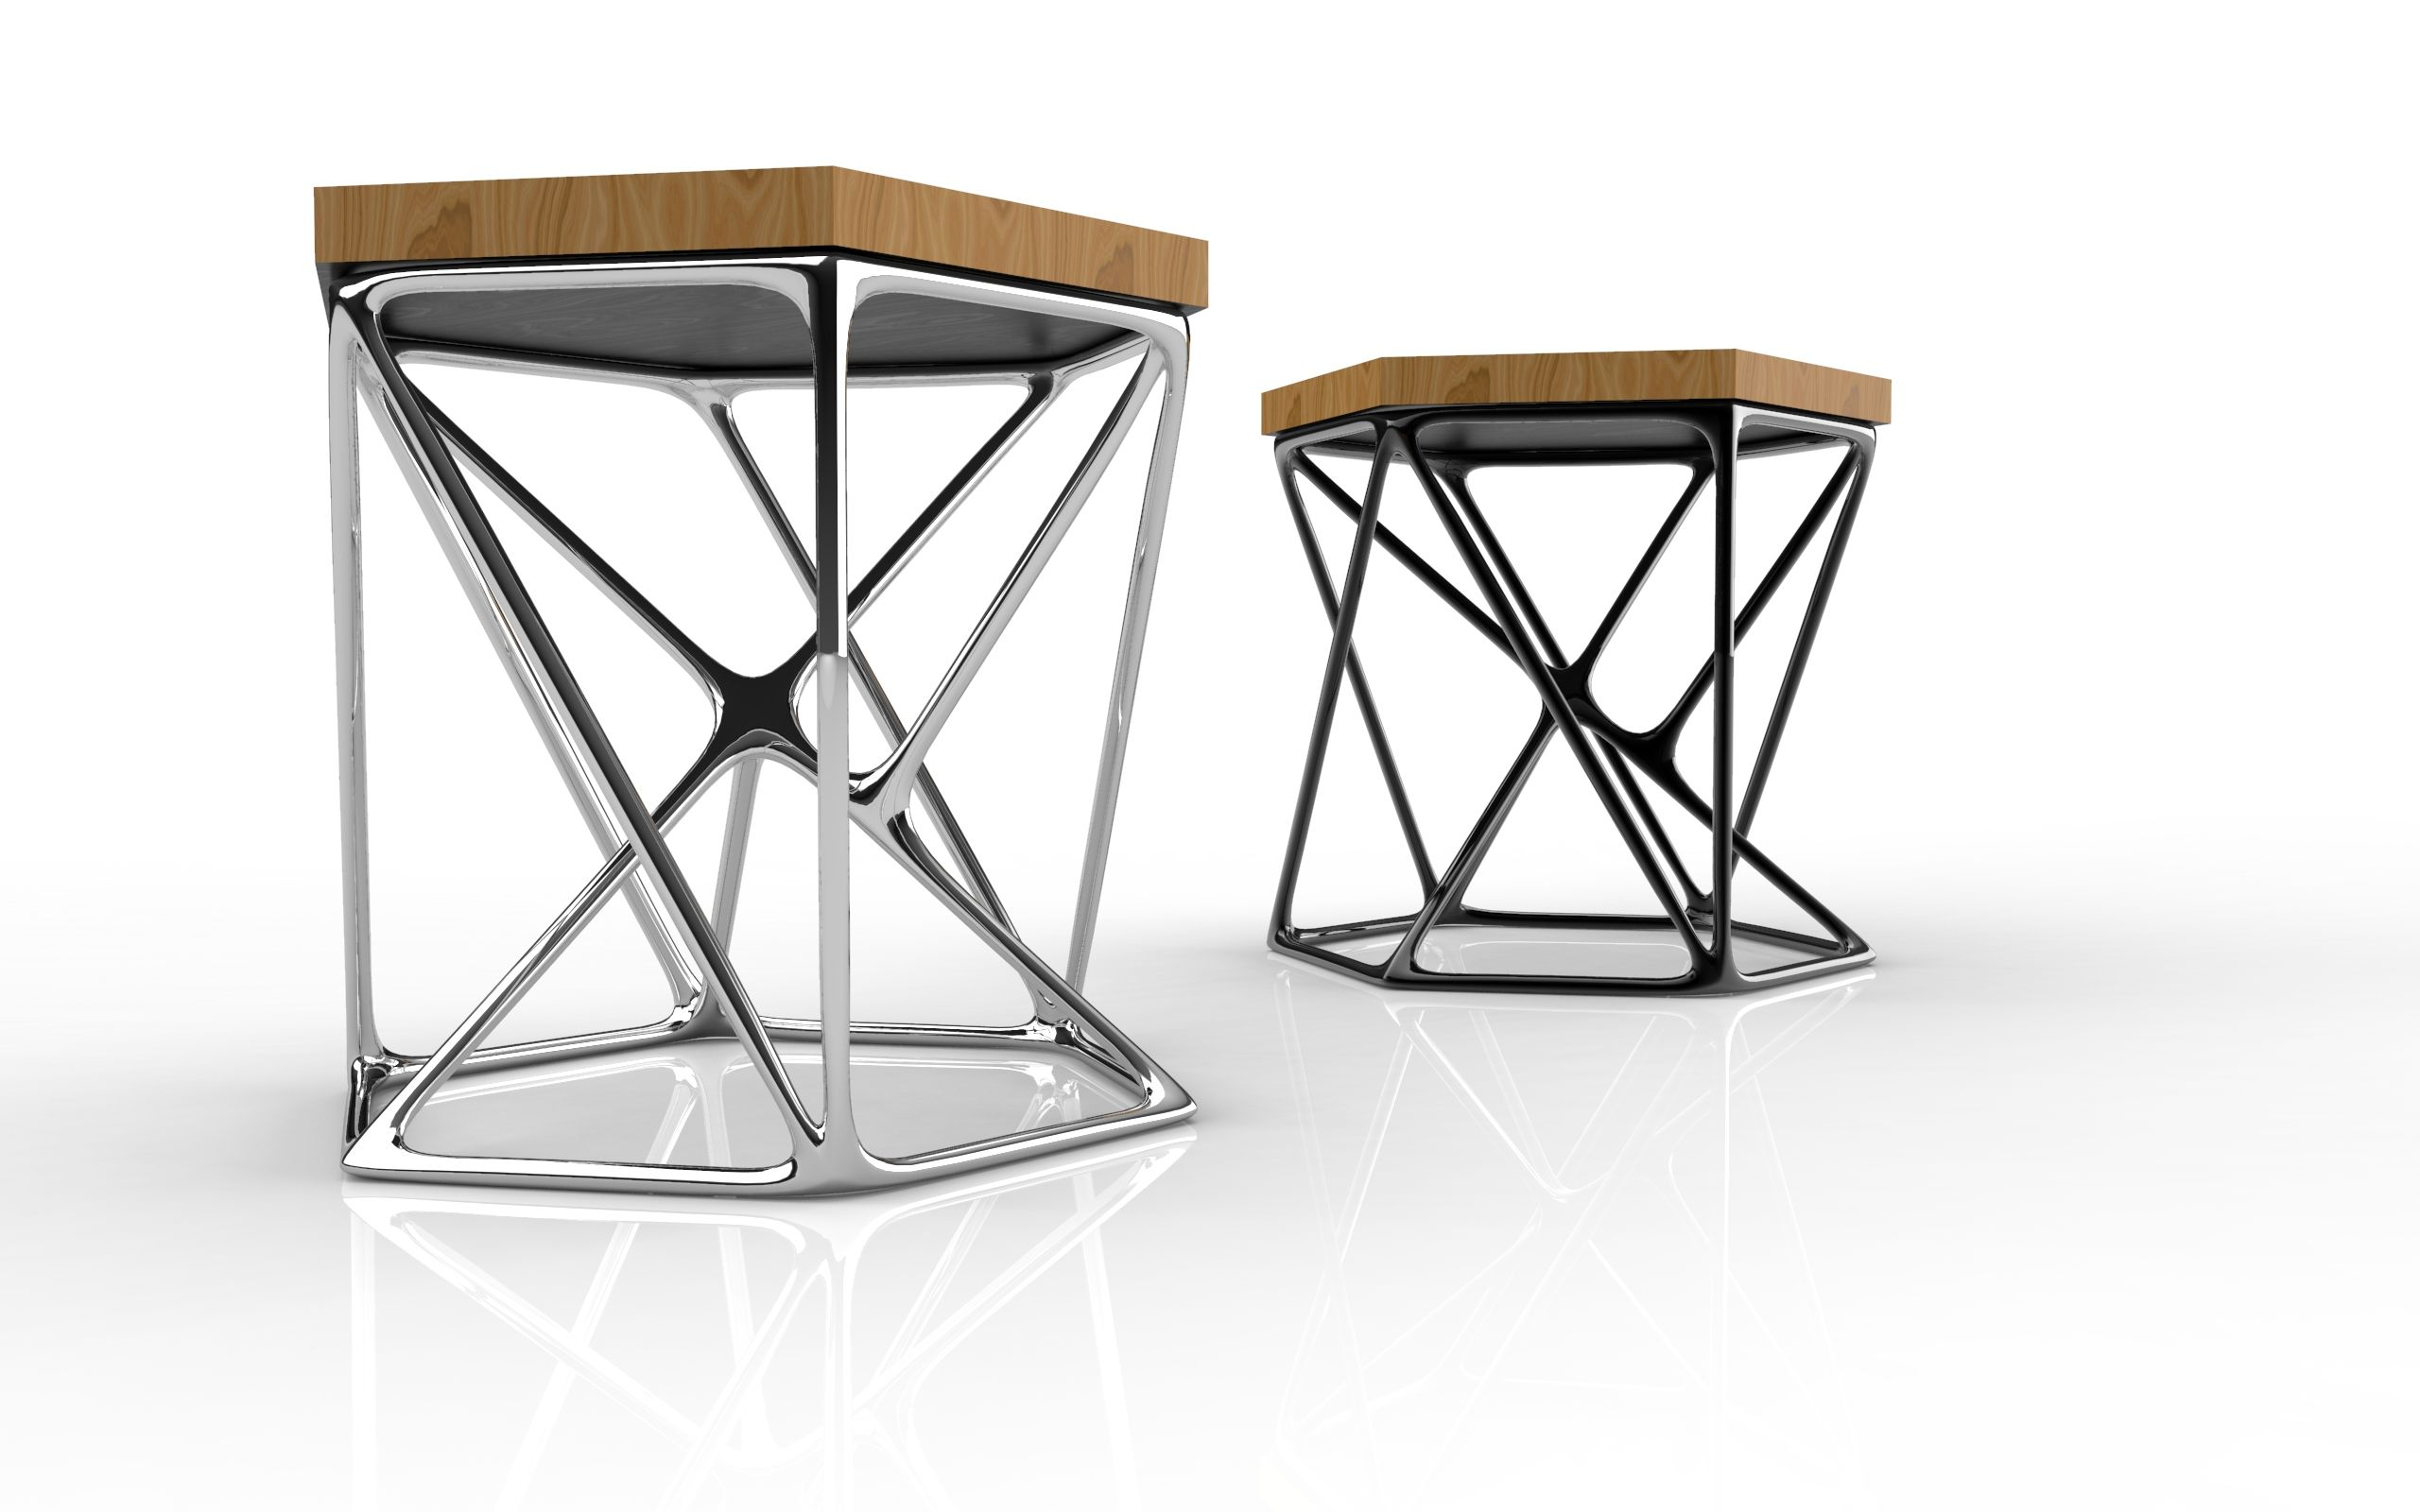 Fabrica-de-nerdes---design-ind5-lcs19-makers-3500-3500